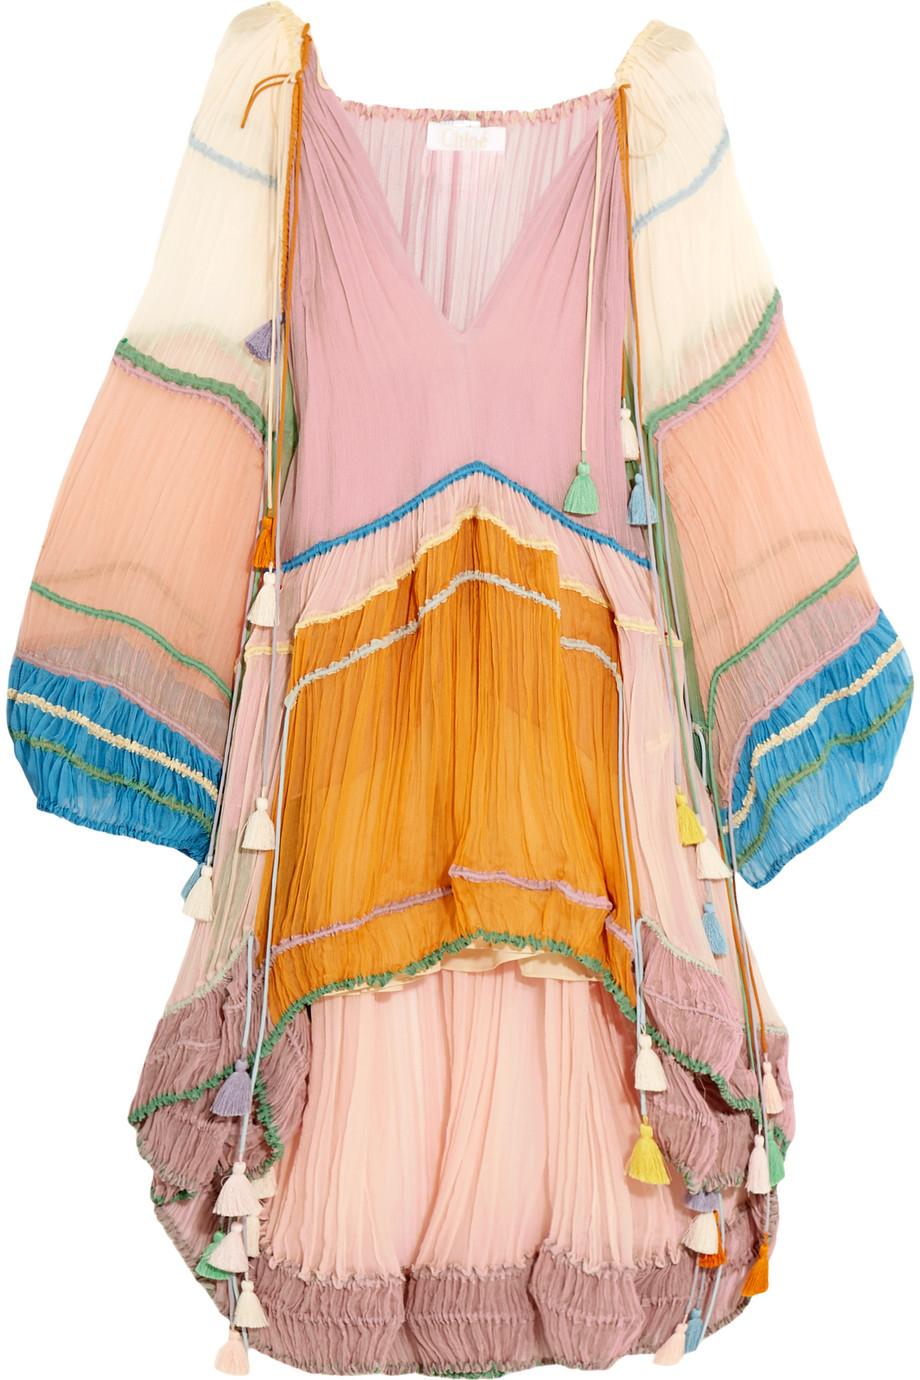 Chloé Tasseled Silk-Crepon Mini Dress, Size: 40